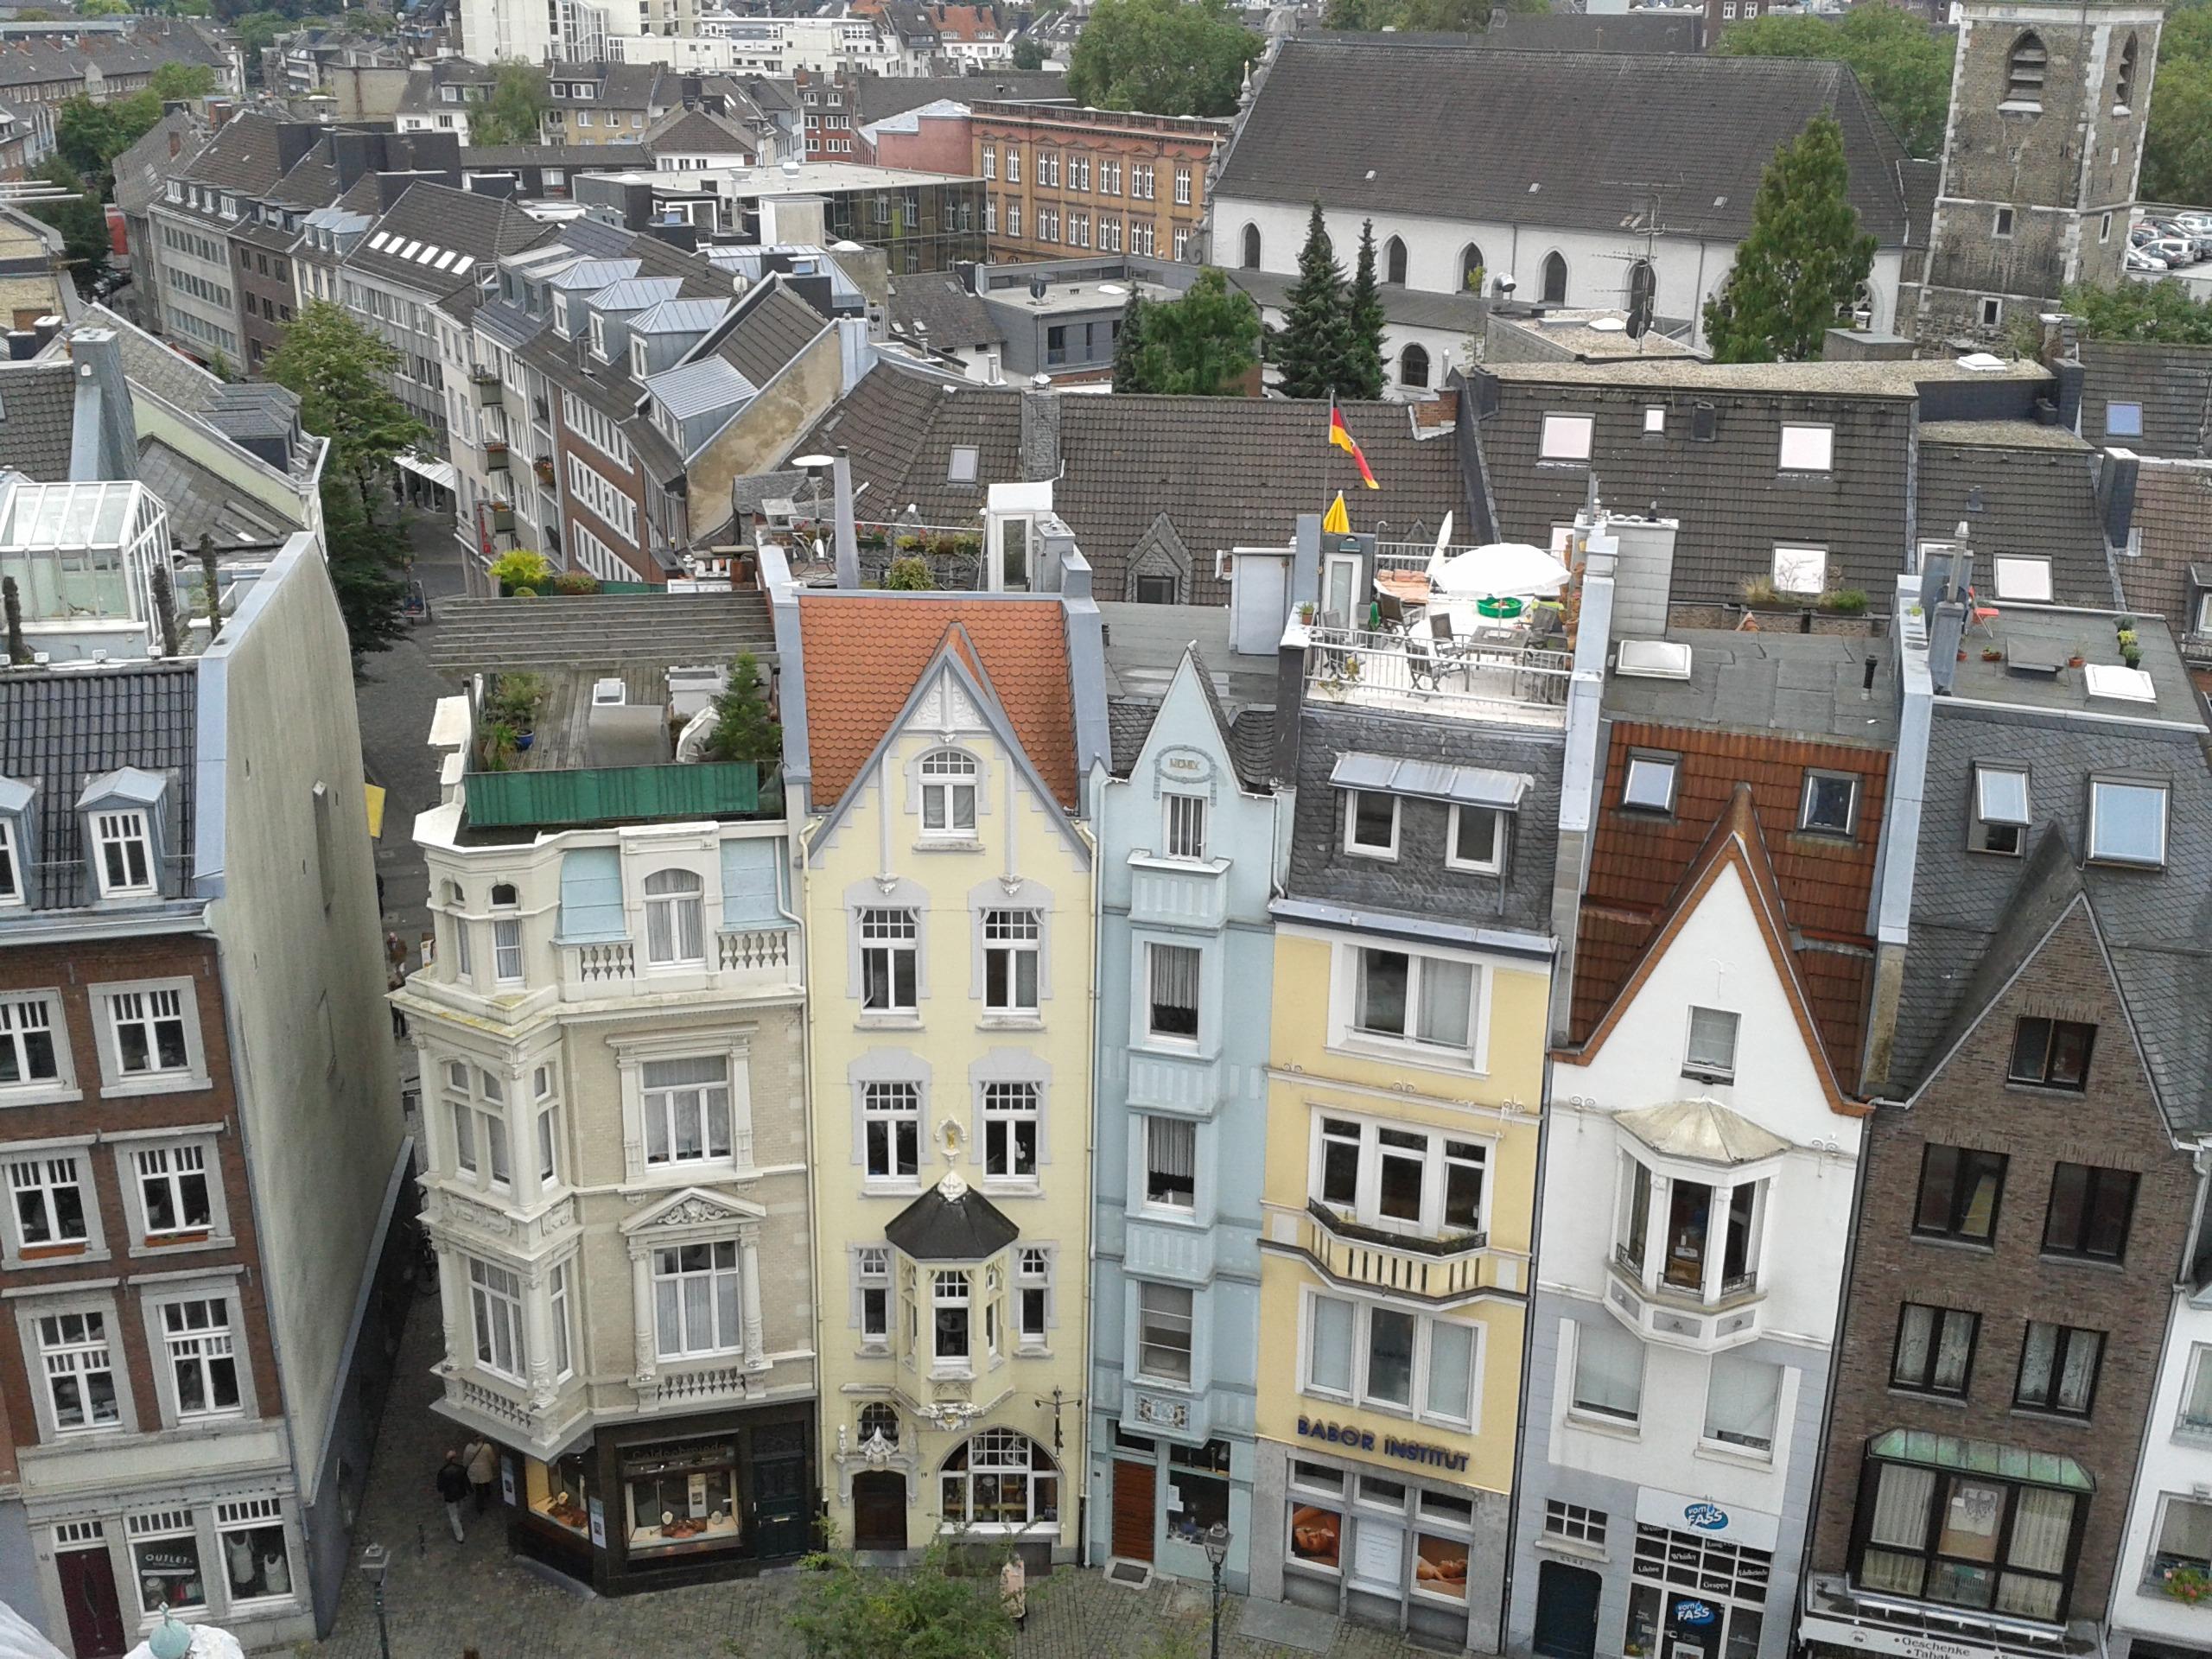 Buildings photo